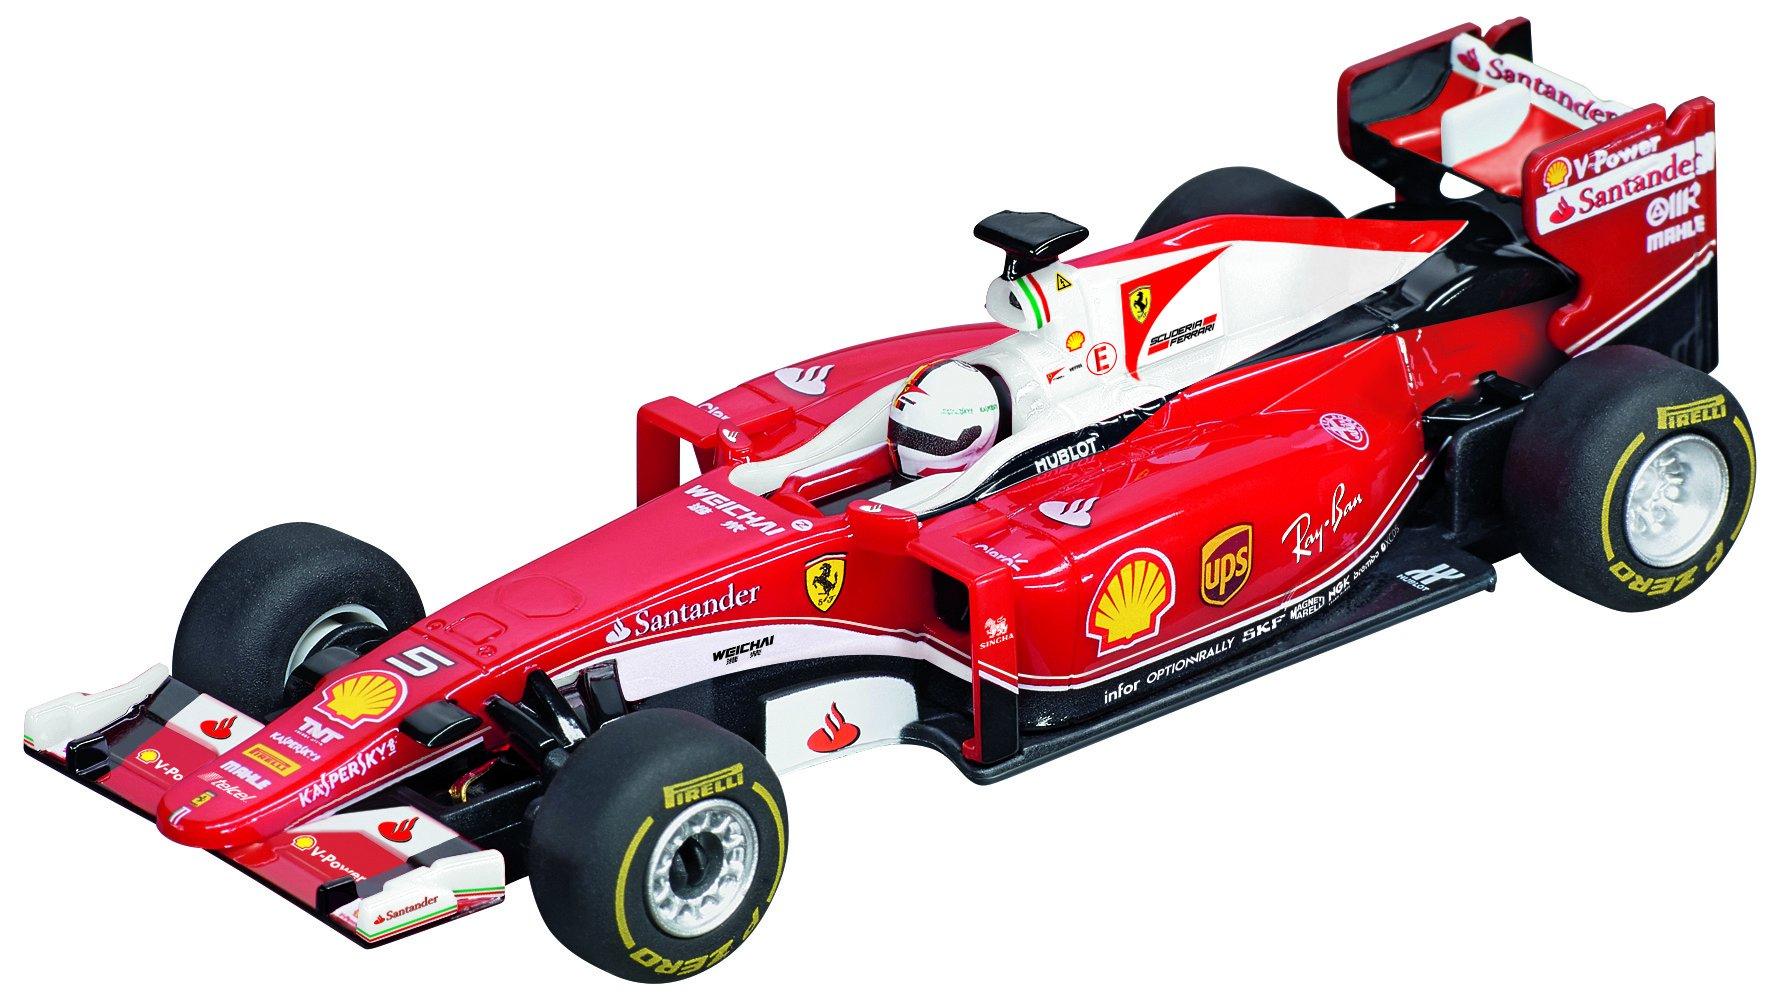 Carrera 64086 GO Slot Car Vehicle-Ferrari SF16-H S.Vettel, No.5 (1:43 Scale)